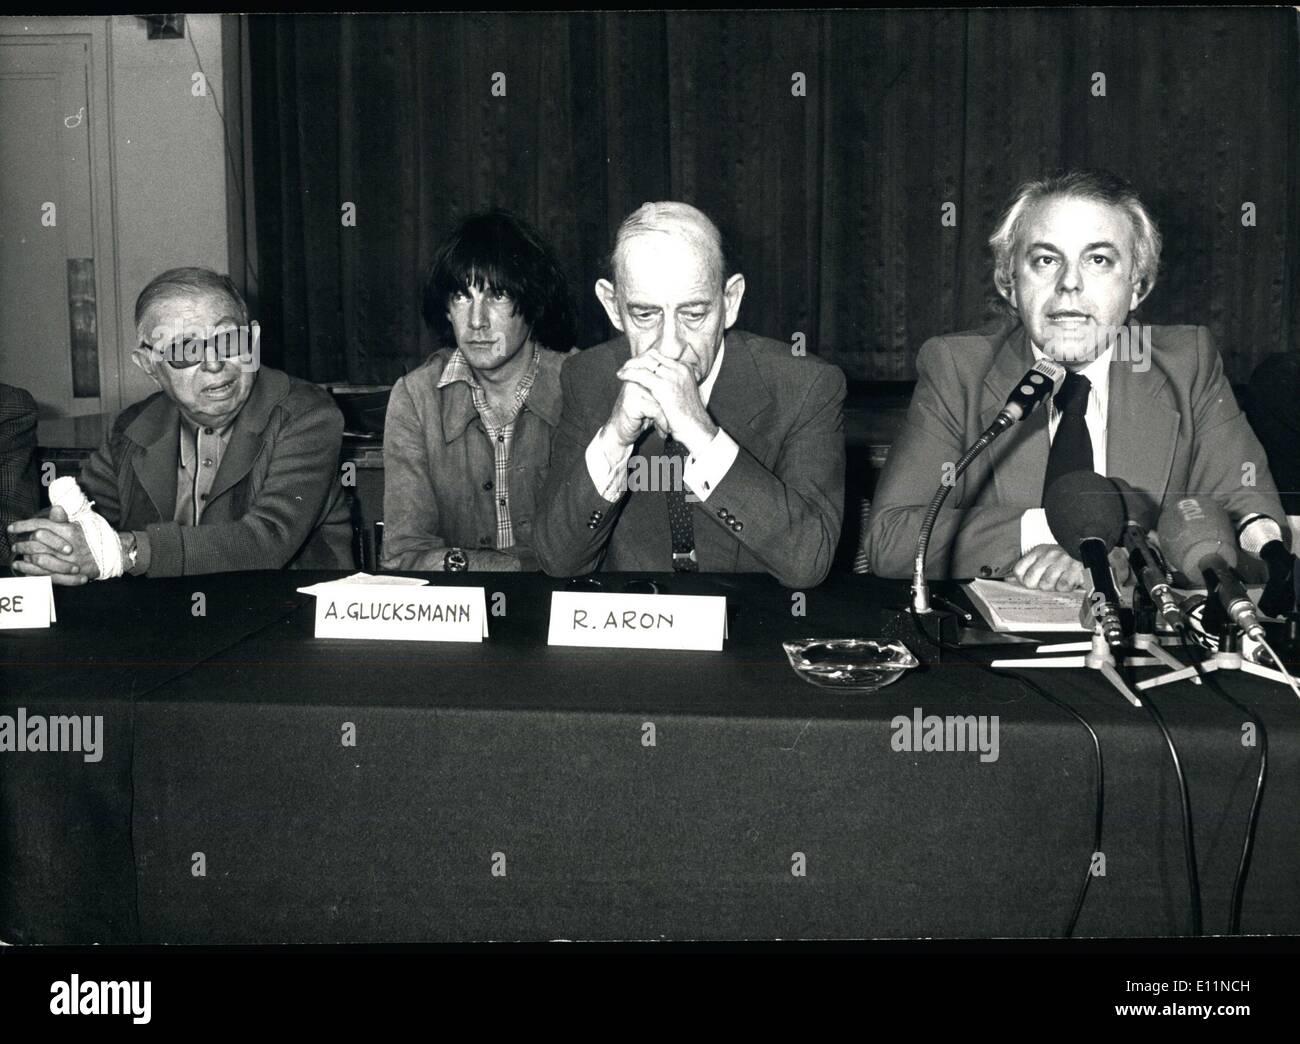 Jun. 21, 1979 - Jean Paul Sartre, Andre Glucksman, R Aron,M Bettati - Stock Image